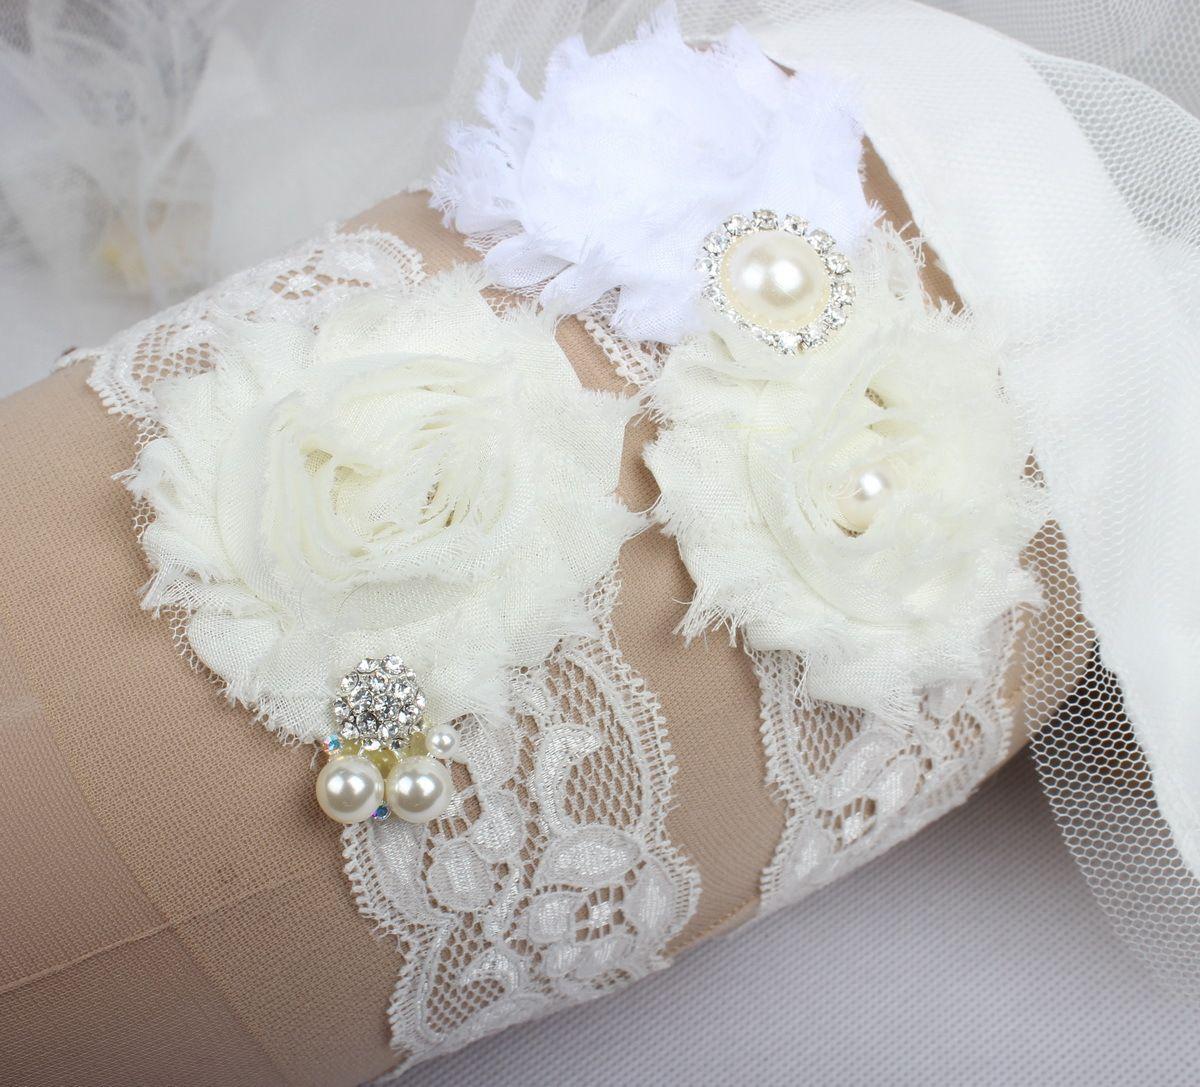 In Stock Lace Bridal Wedding Garter set with Rhinestones and Ivory Chiffon Flowers Country Wedding Bridal Leg Garters